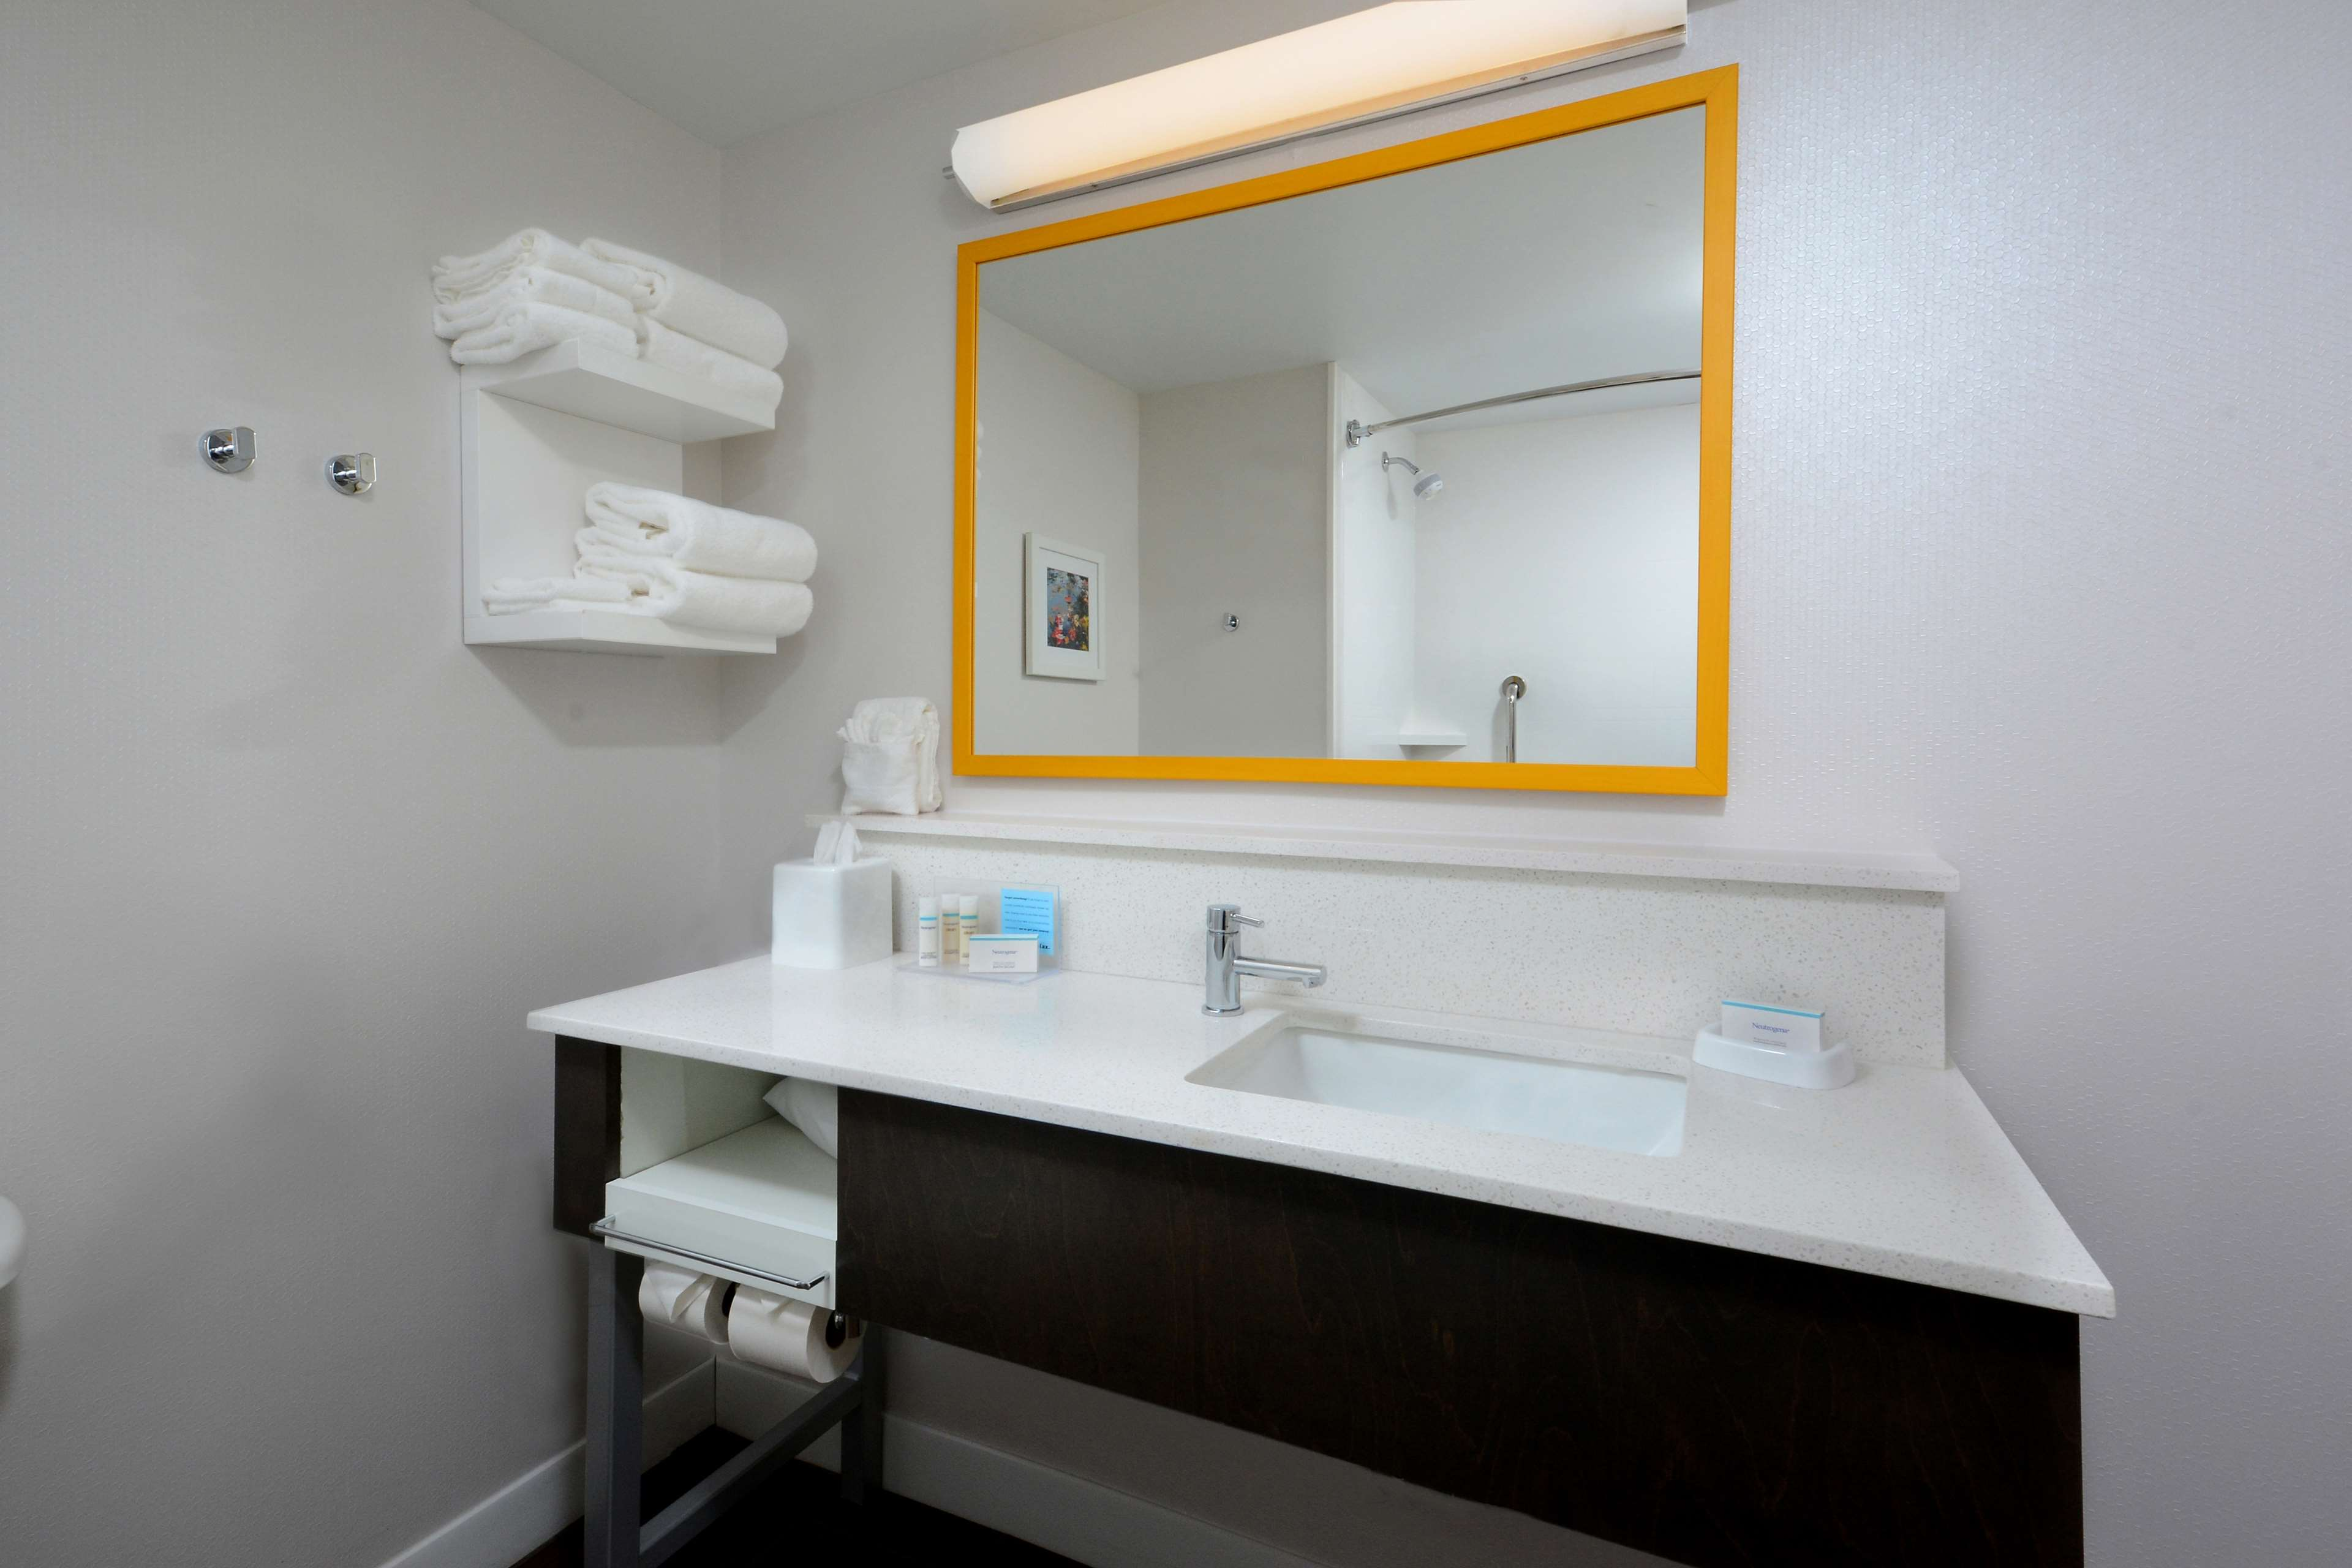 Hampton Inn & Suites Greenville/Spartanburg I-85 image 26